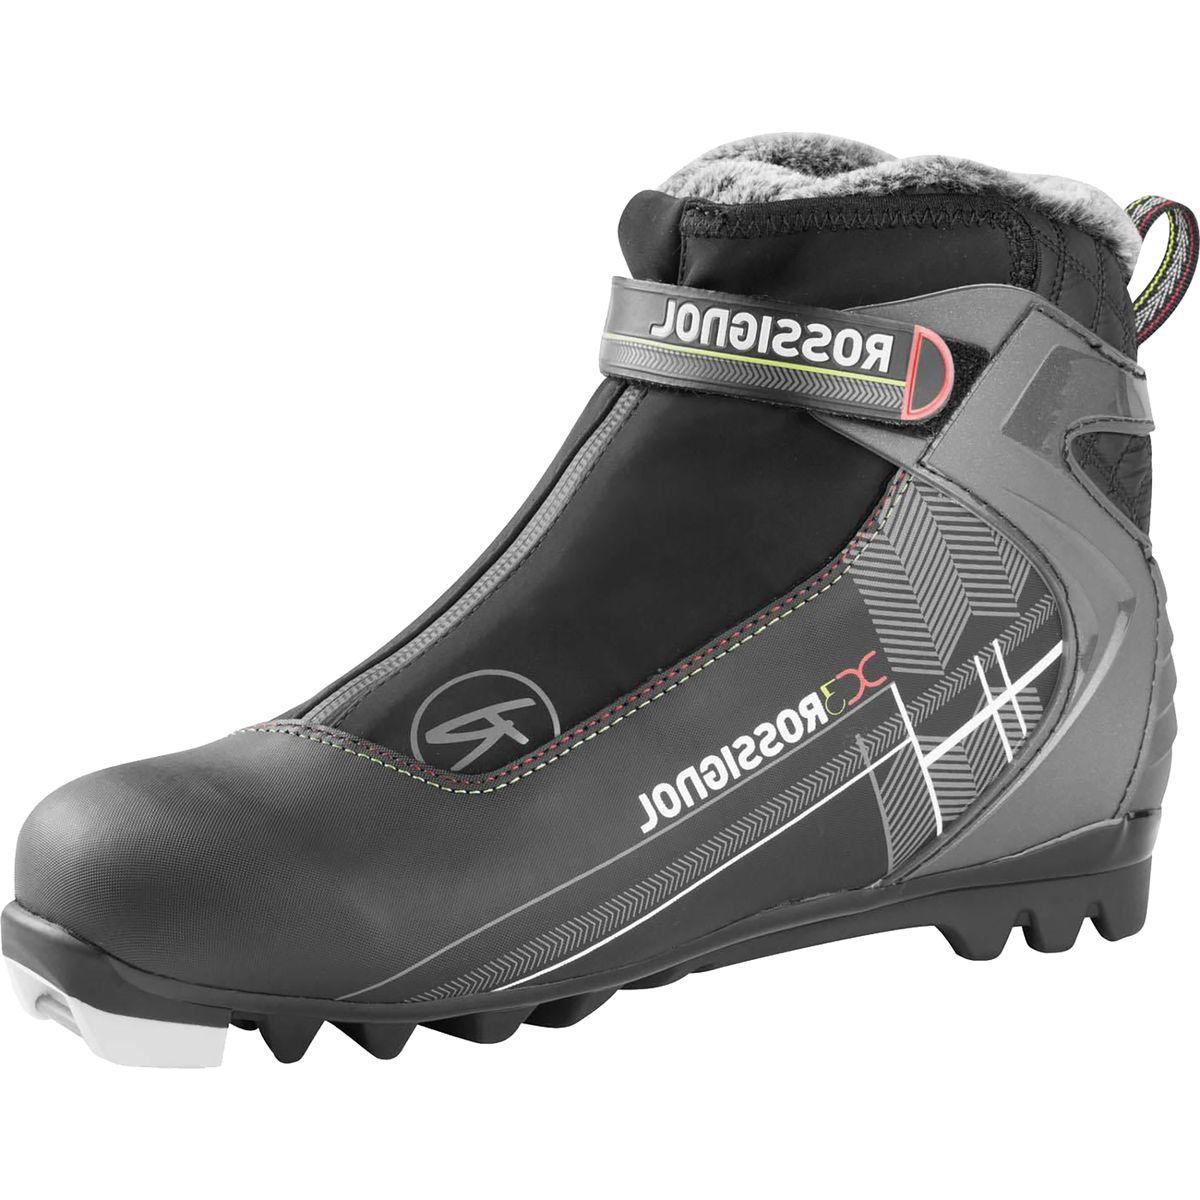 Rossignol X3 FW Touring Boot - Women's